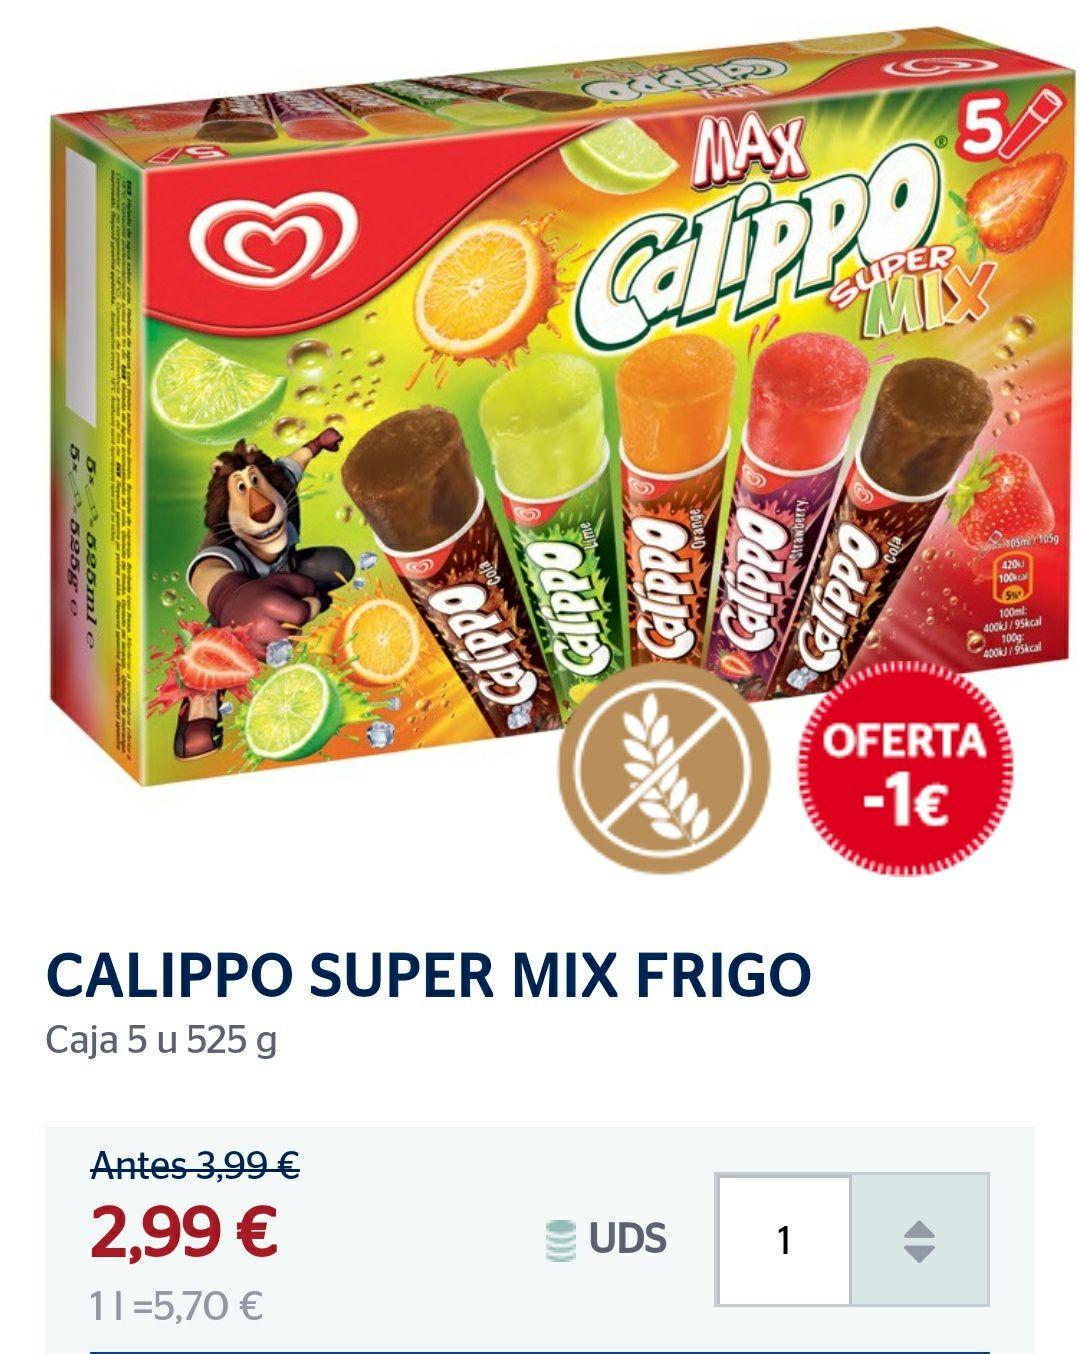 CALIPO MIX 0,60€ LA UNIDAD.